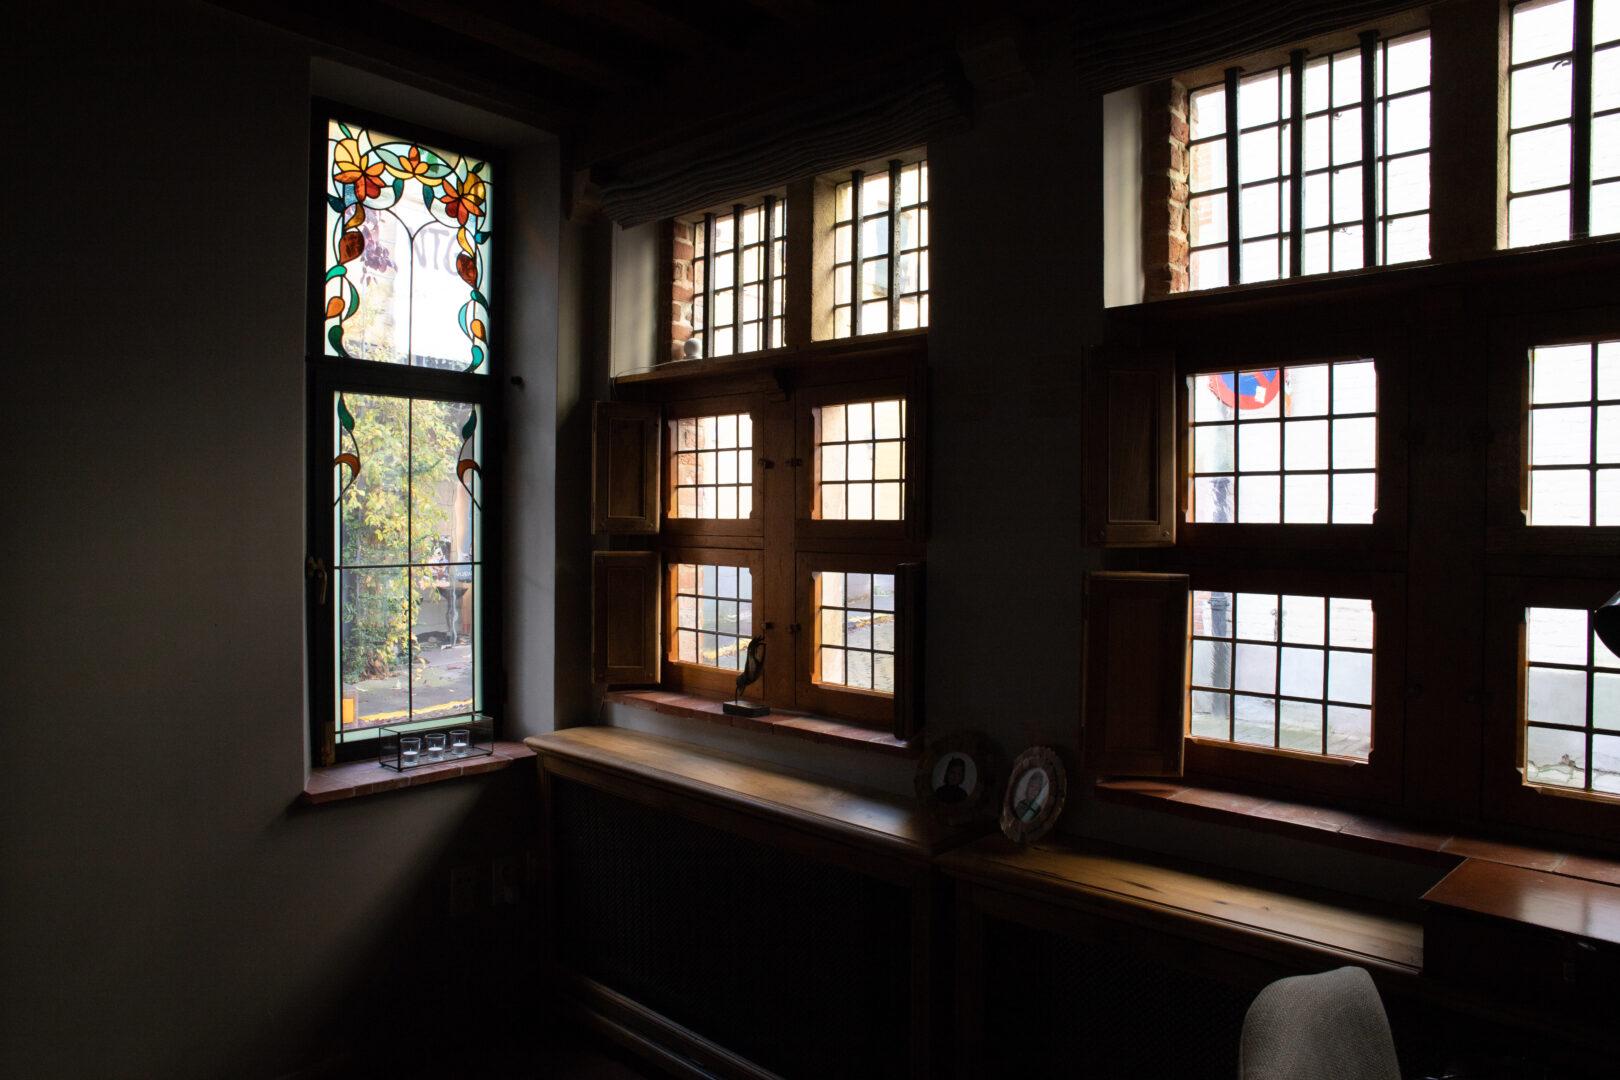 Decoratief glas-in-lood in ramen, privé-woning in centrum Gent. Ontwerp: Ingrid Meyvaert (©Nadia El Makhfi)